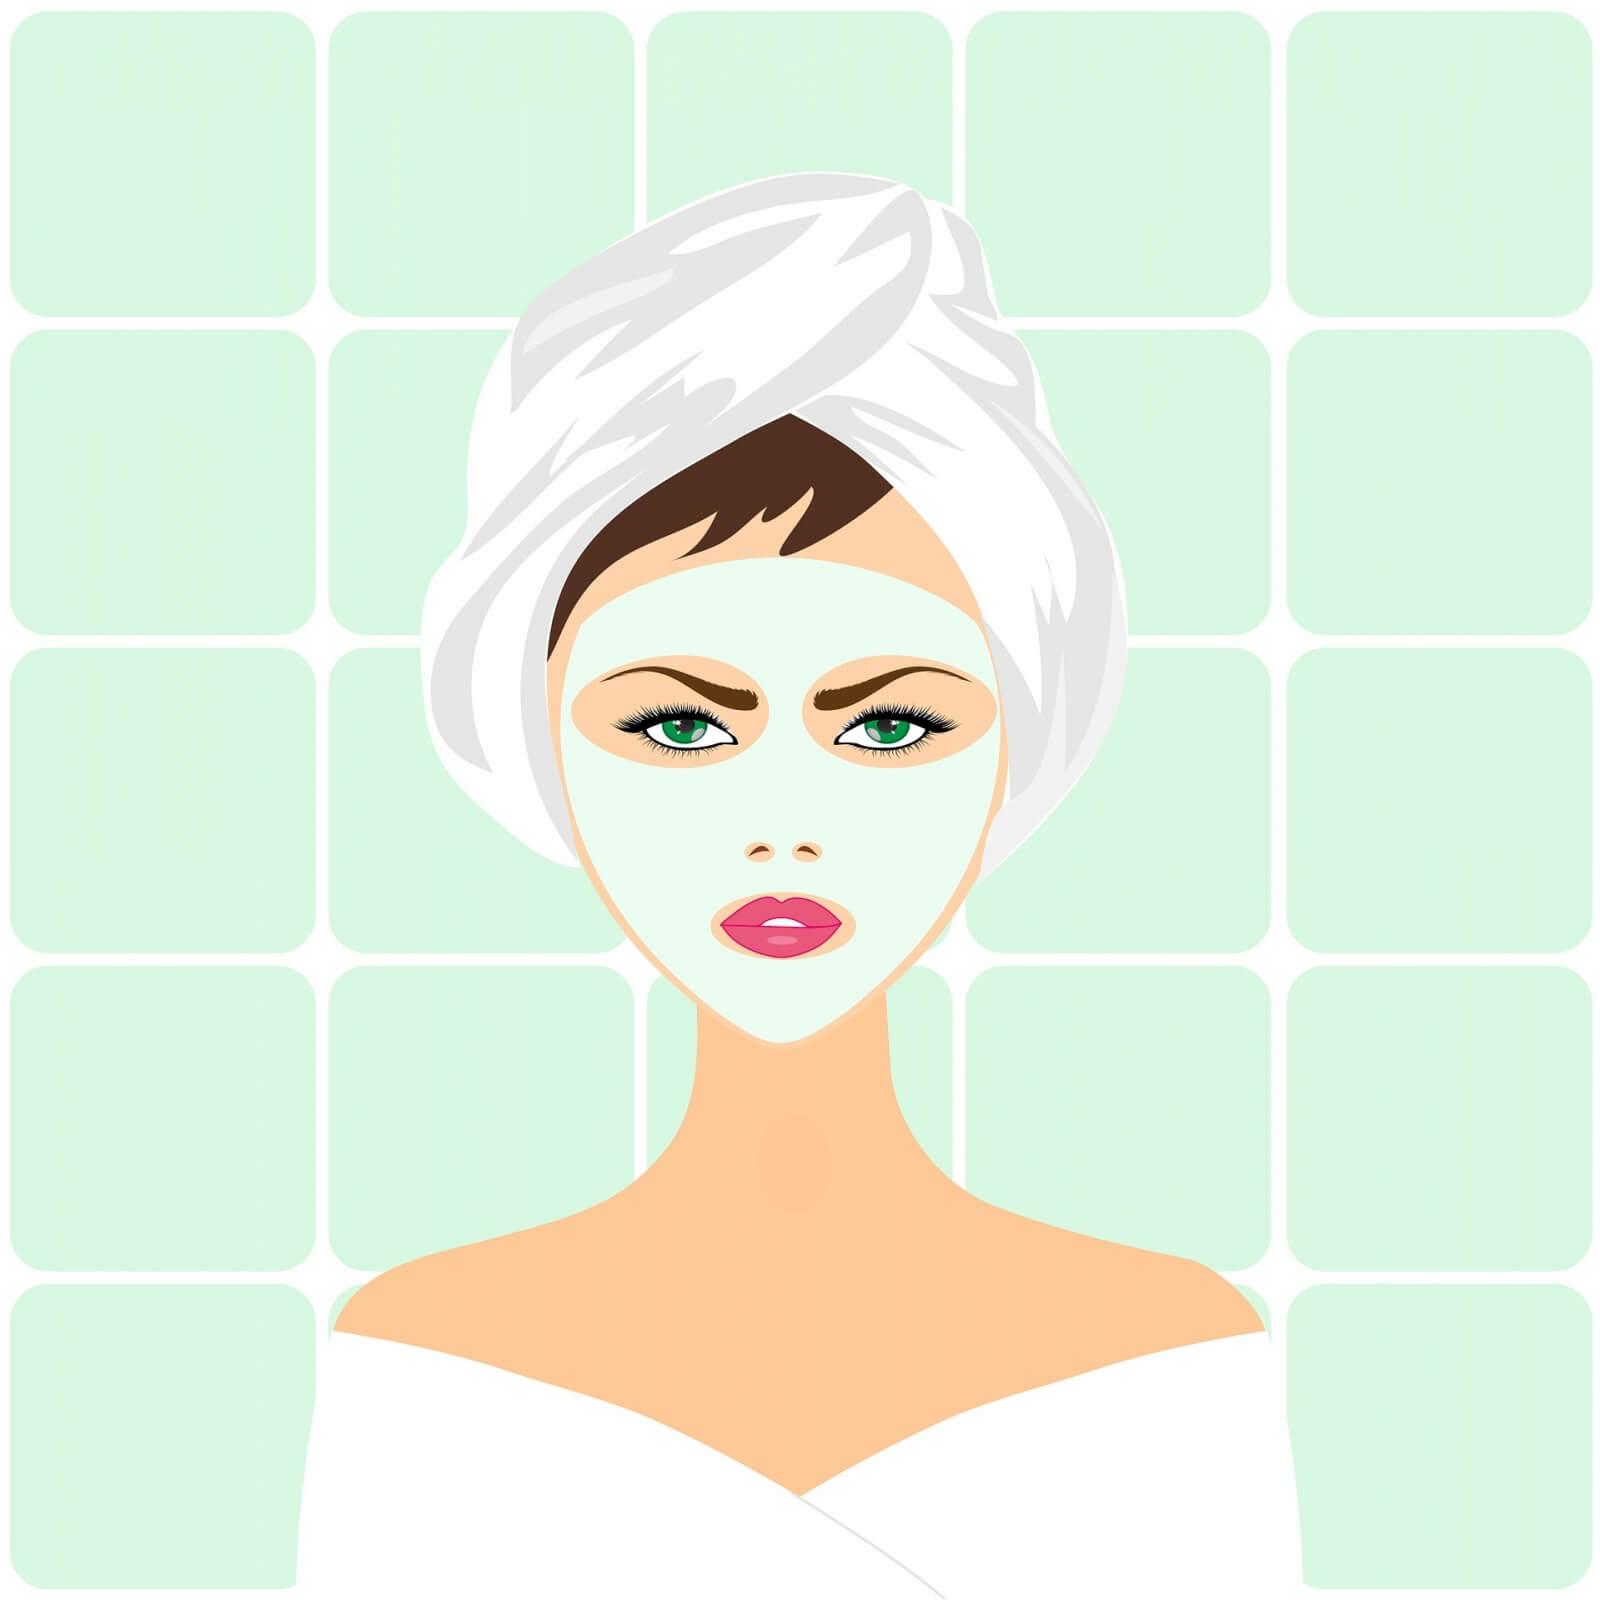 calcium-benefits-abloomnova.net_.-1600x1600 The amazing calcium benefits for skin